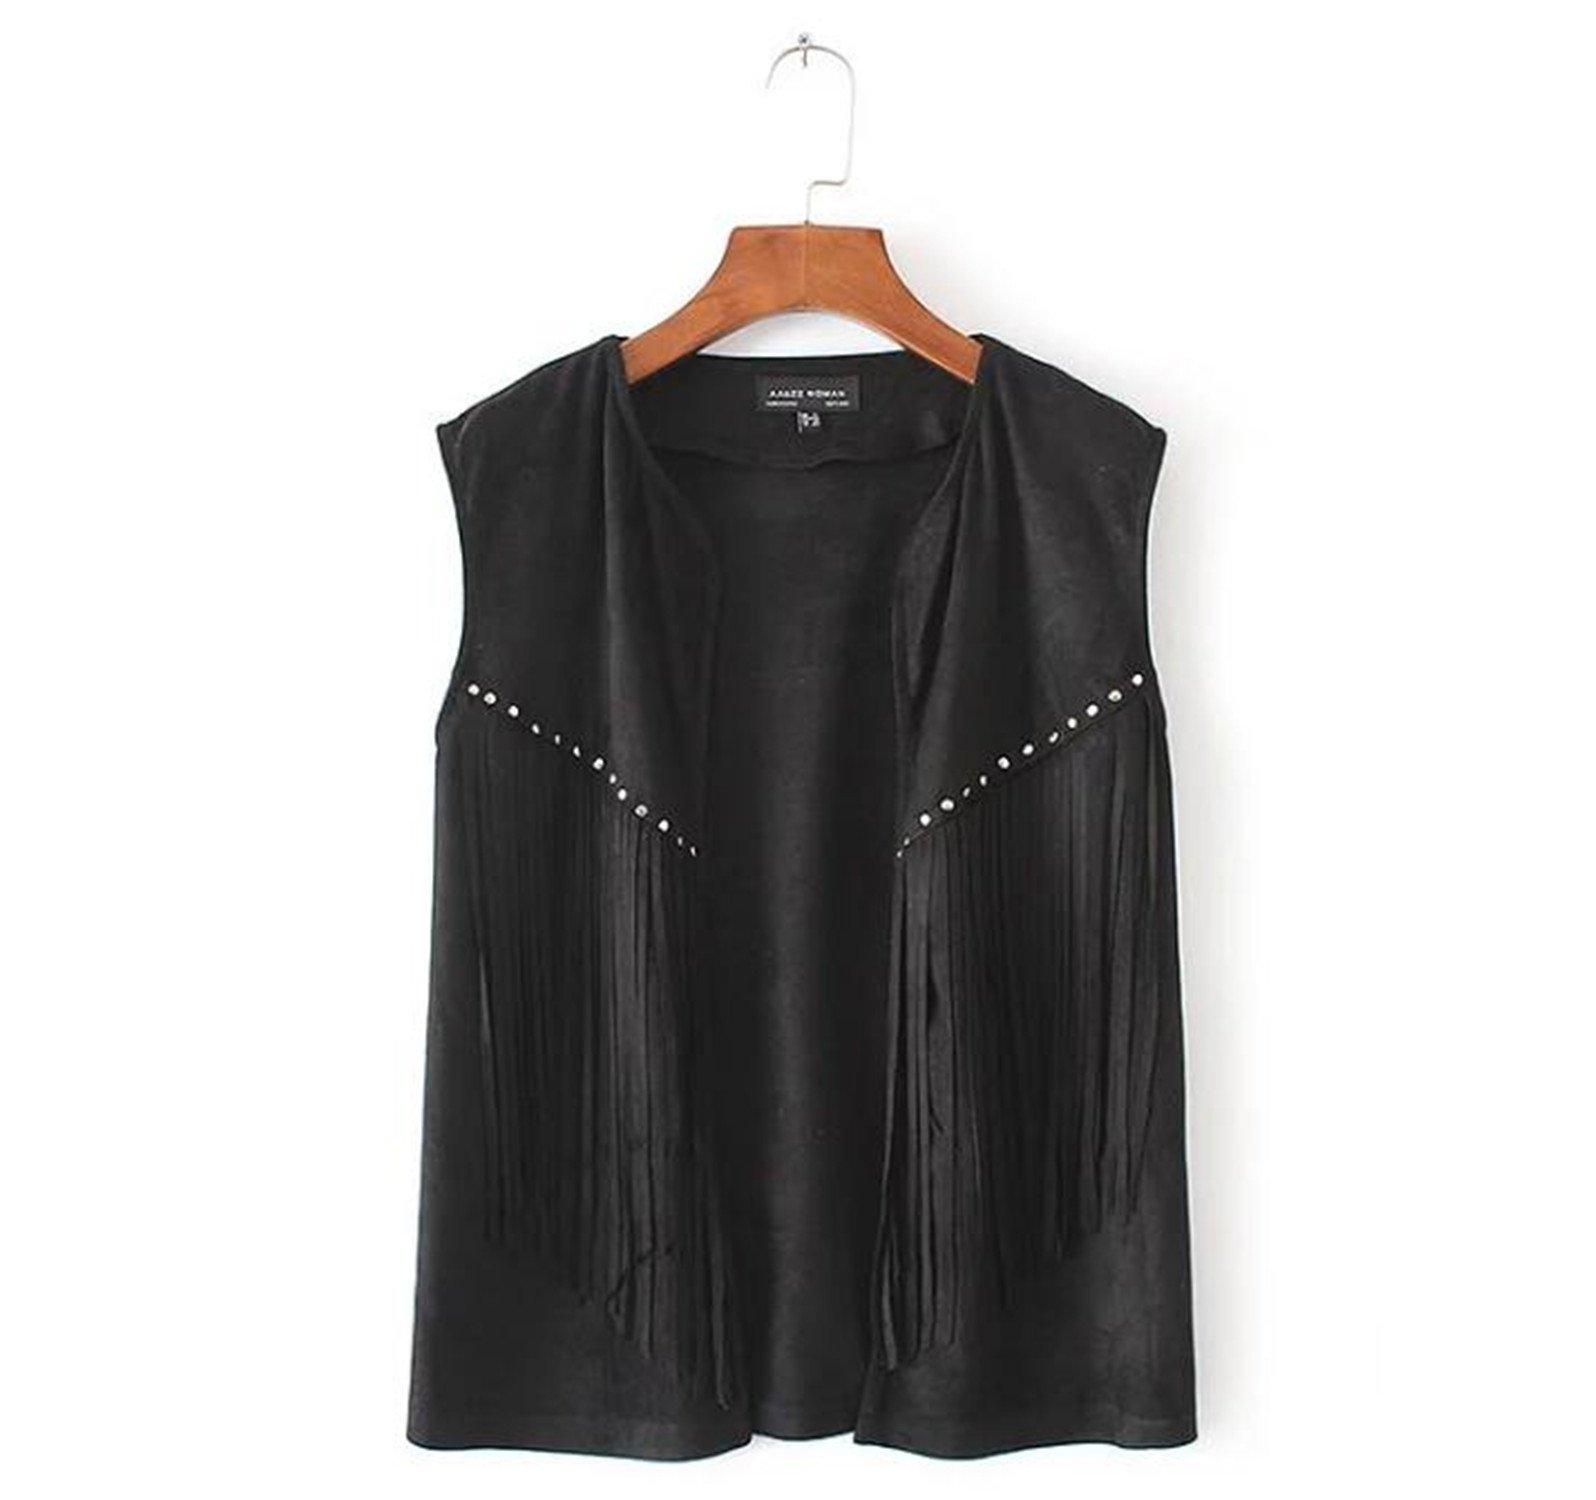 Kongsta Women Brown Black Color Fringe Tassel Vest 80'S Boho Hippie Street Style Suede Vests Ladies Fashion Suede Waistcoat